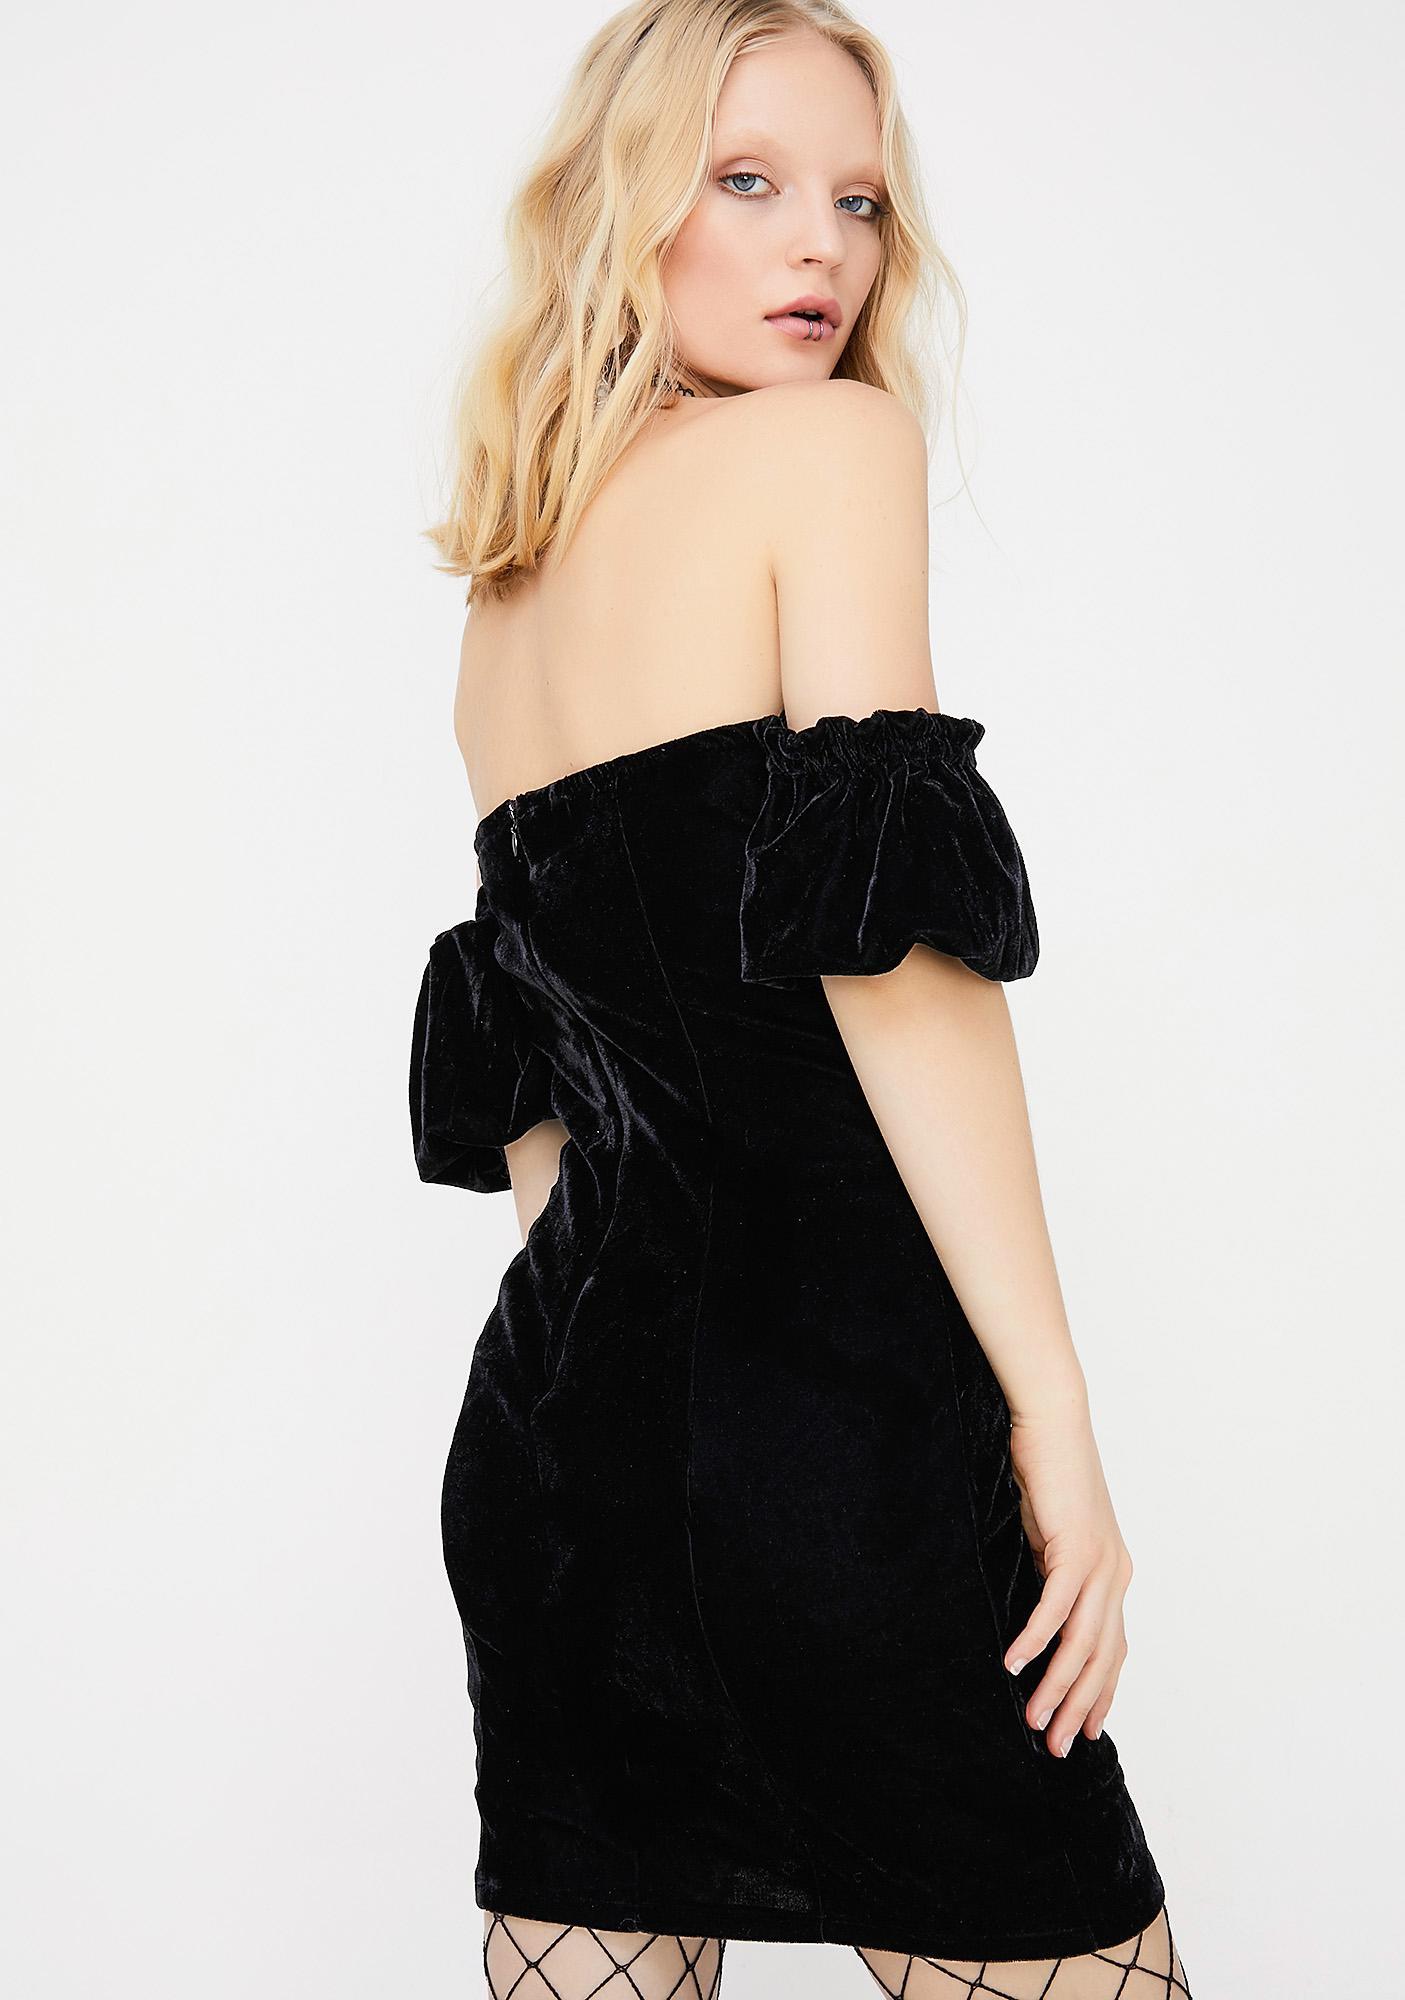 Firzt Luv Off The Shoulder Dress